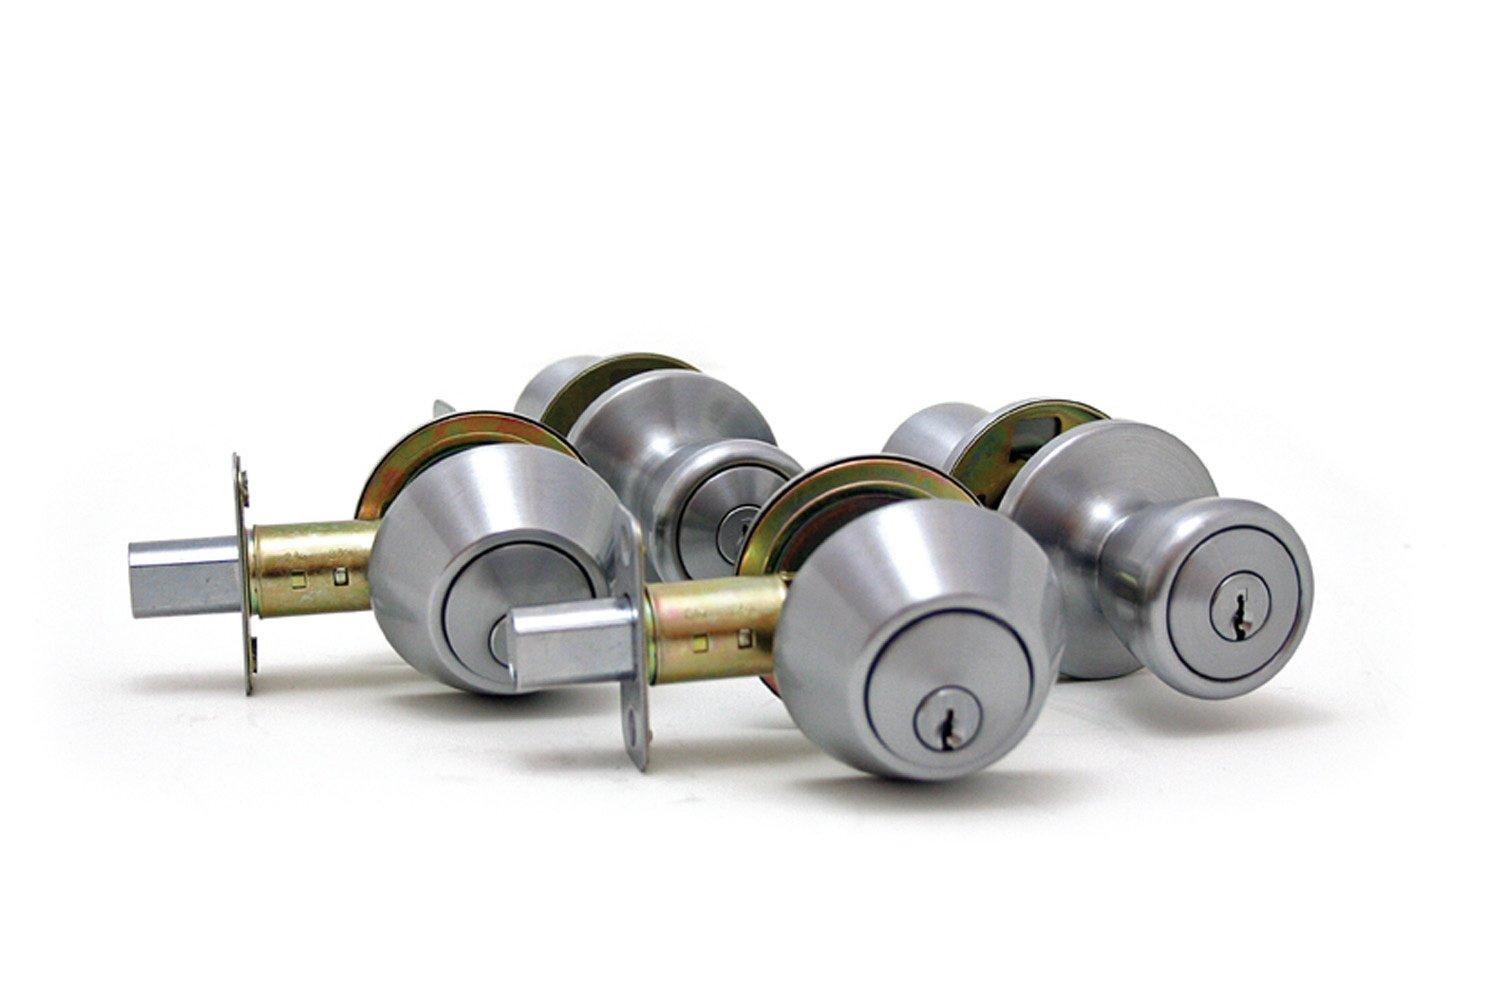 Lewis Hyman 1738002 Atlas Home Security Door Lock Kit, Satin Nickel